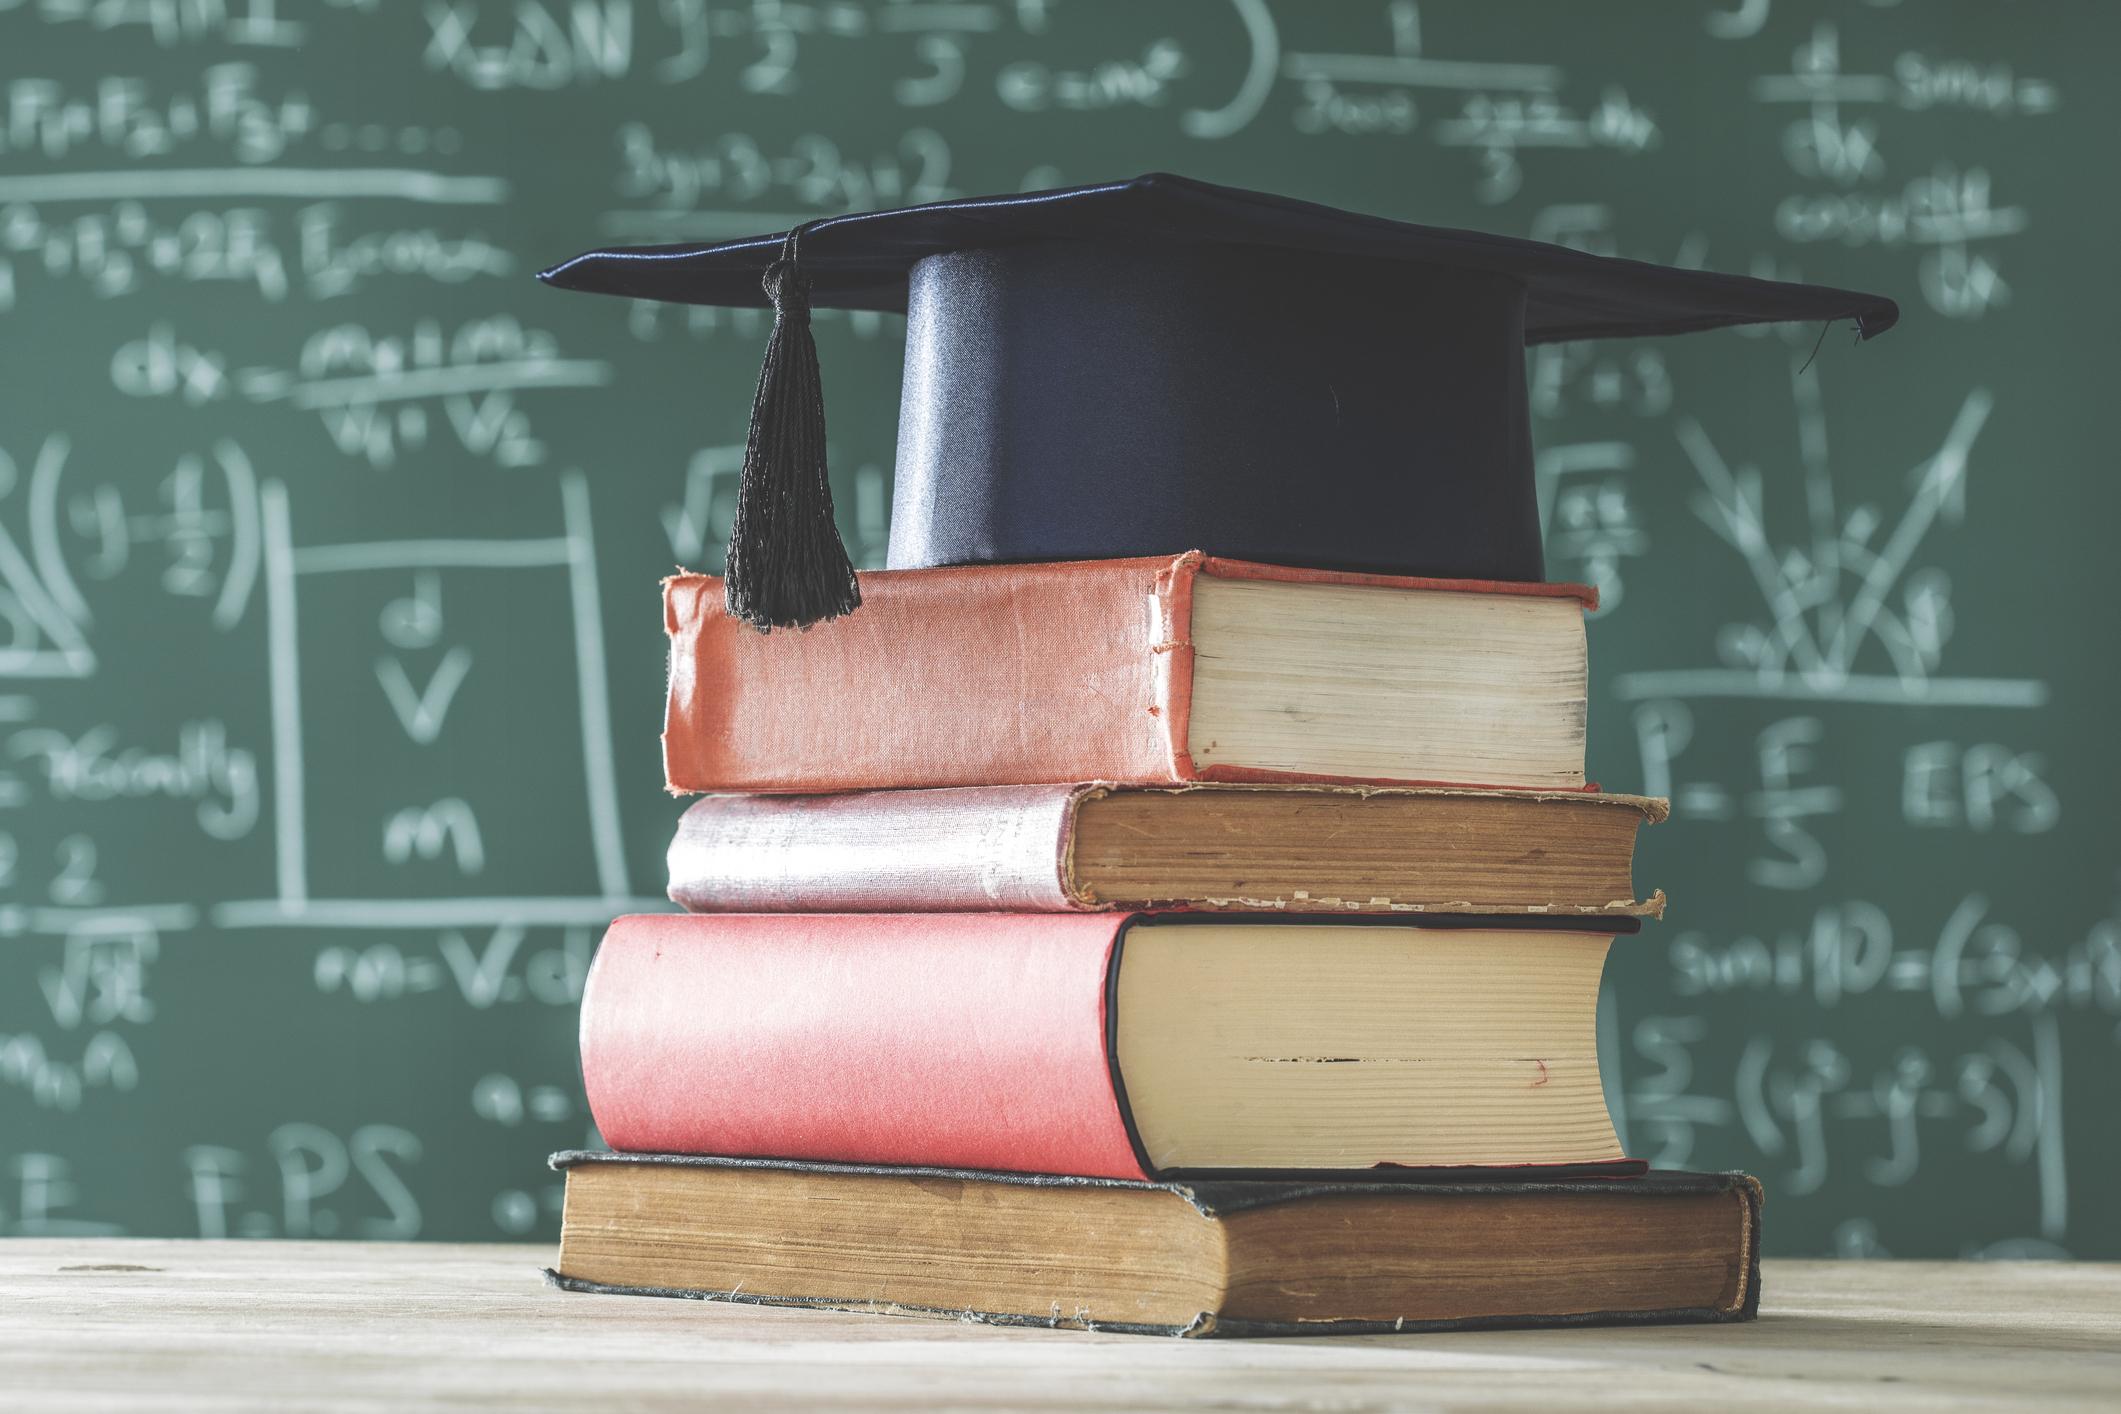 Comunicado oficial: curso académico 2019/2020